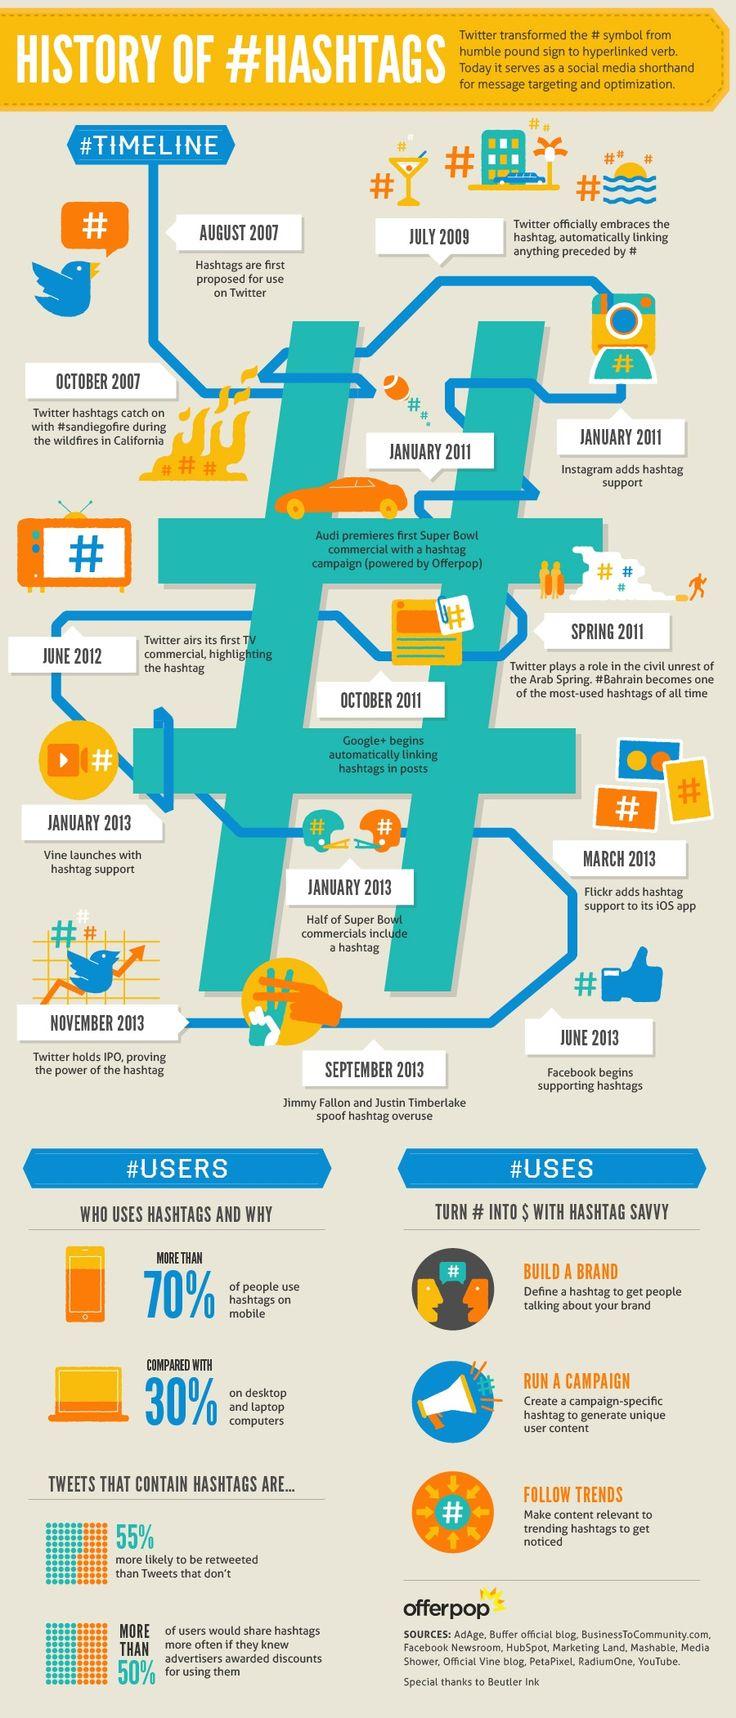 The #History of #Hashtags #infographic hashtagapalooza :-)